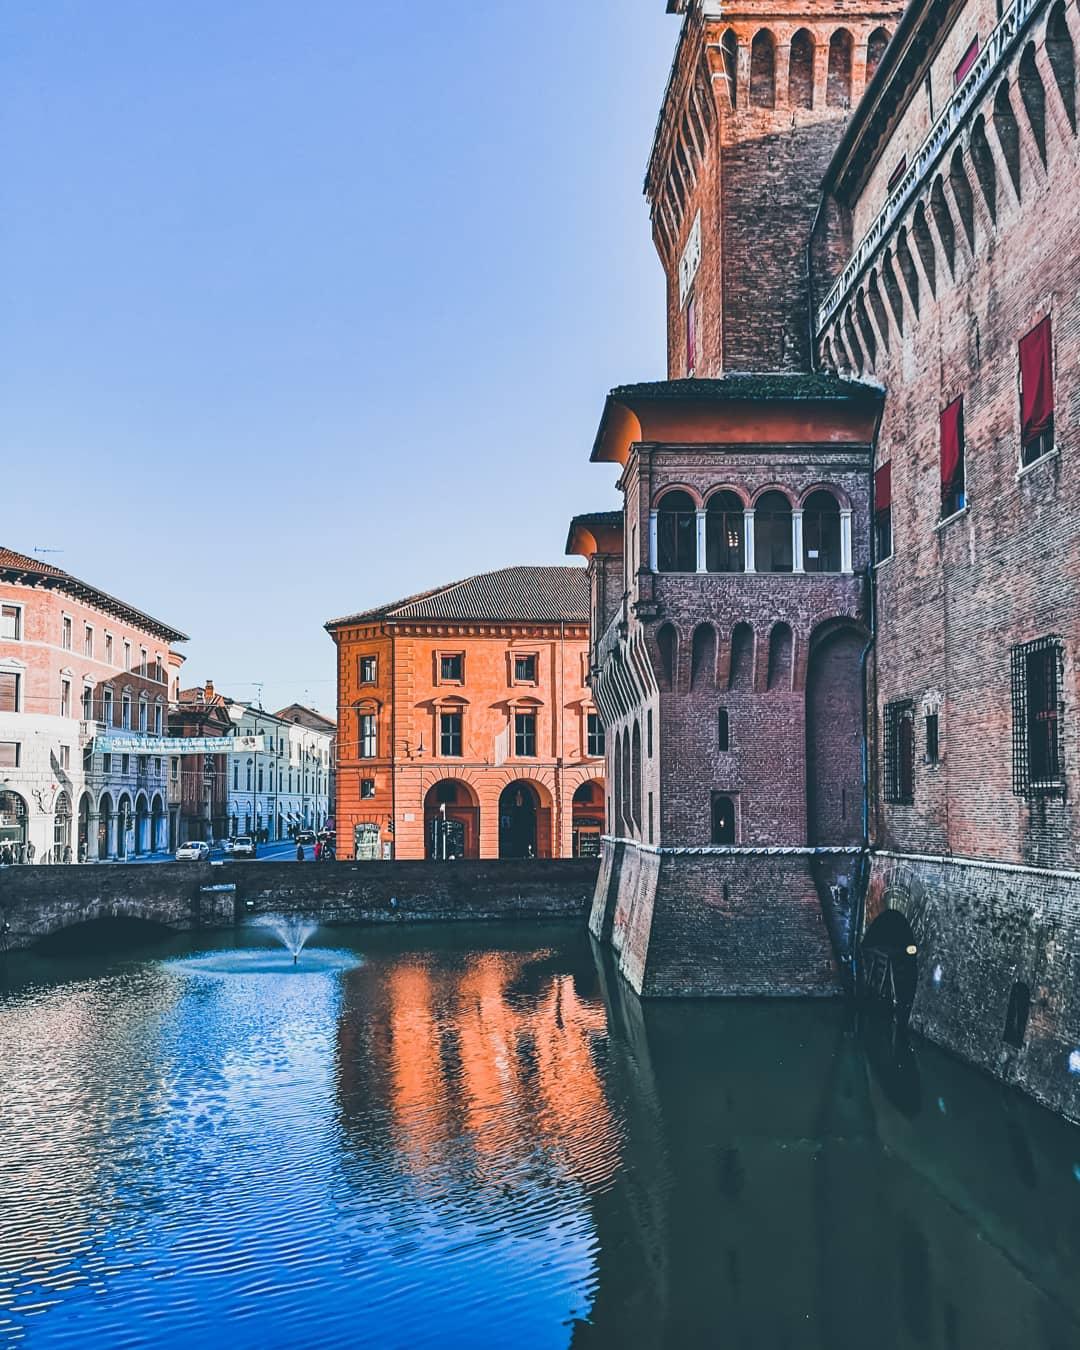 [Parlami di tER] Ferrara tra storia, leggende e miracoli